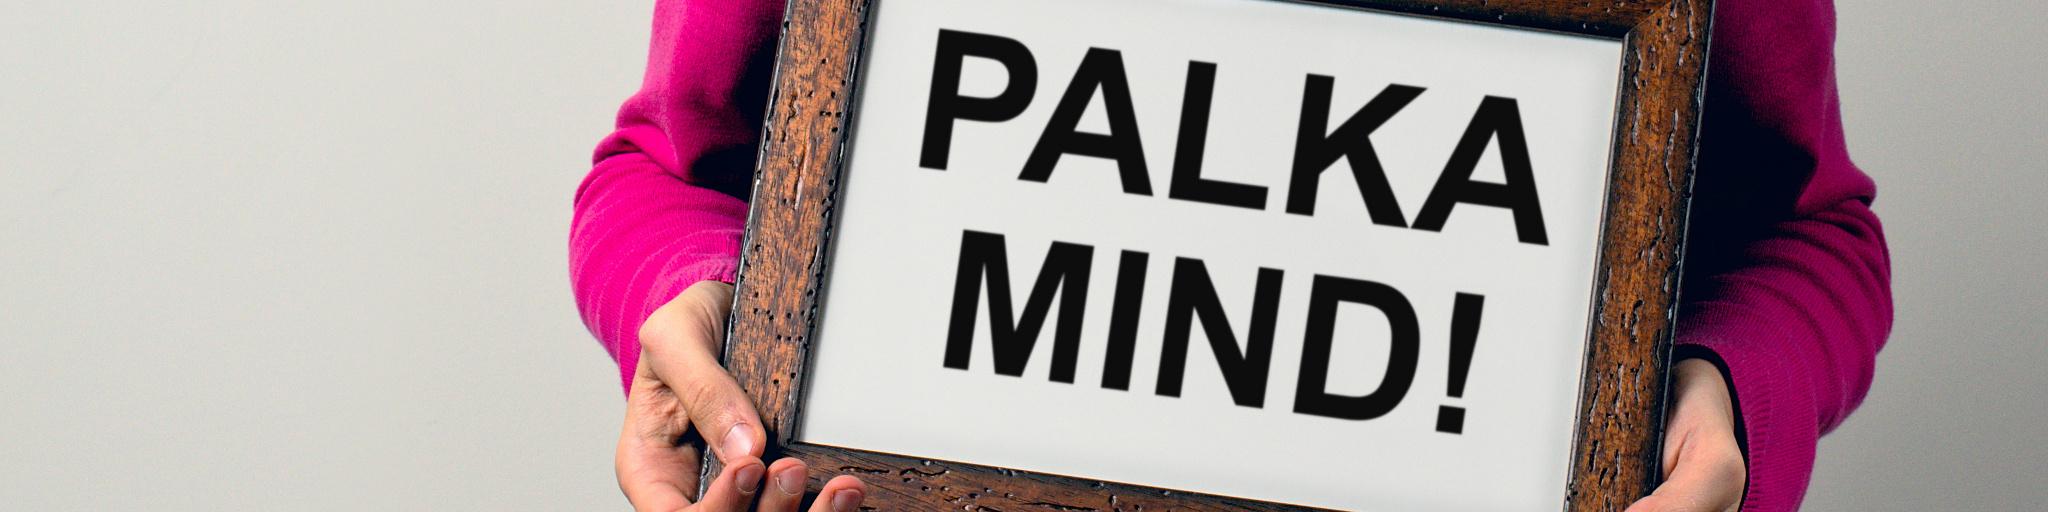 Palka mind! feature image